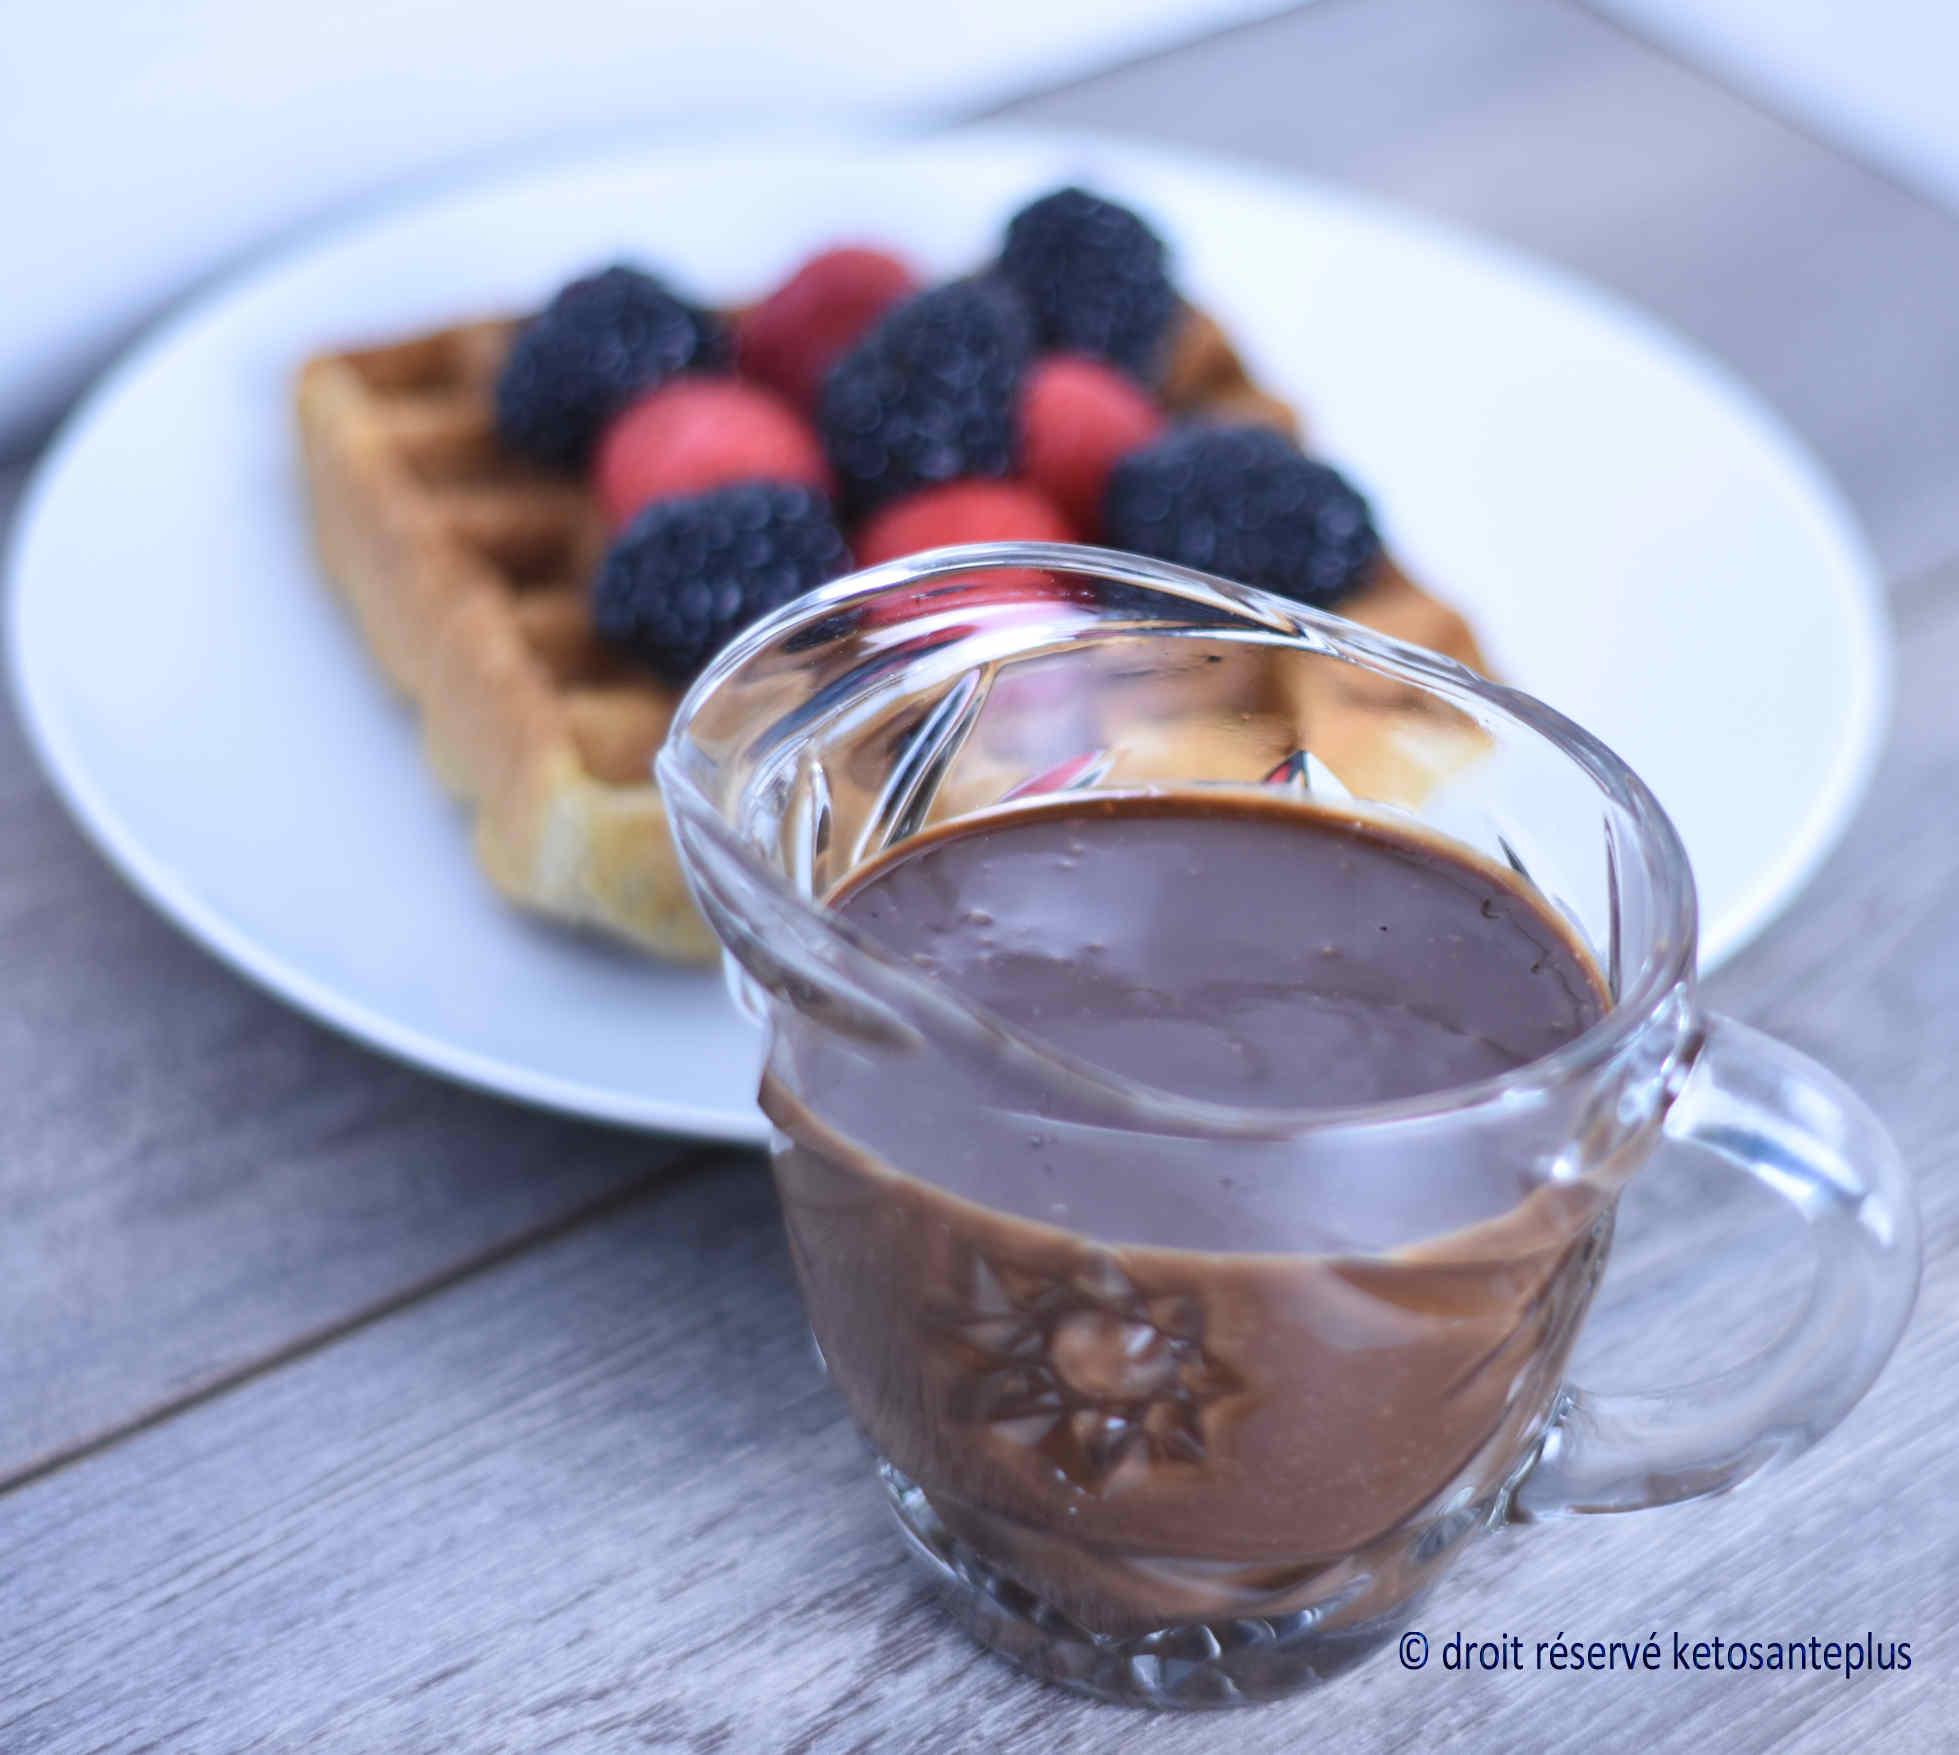 Sauce chaude au chocolat